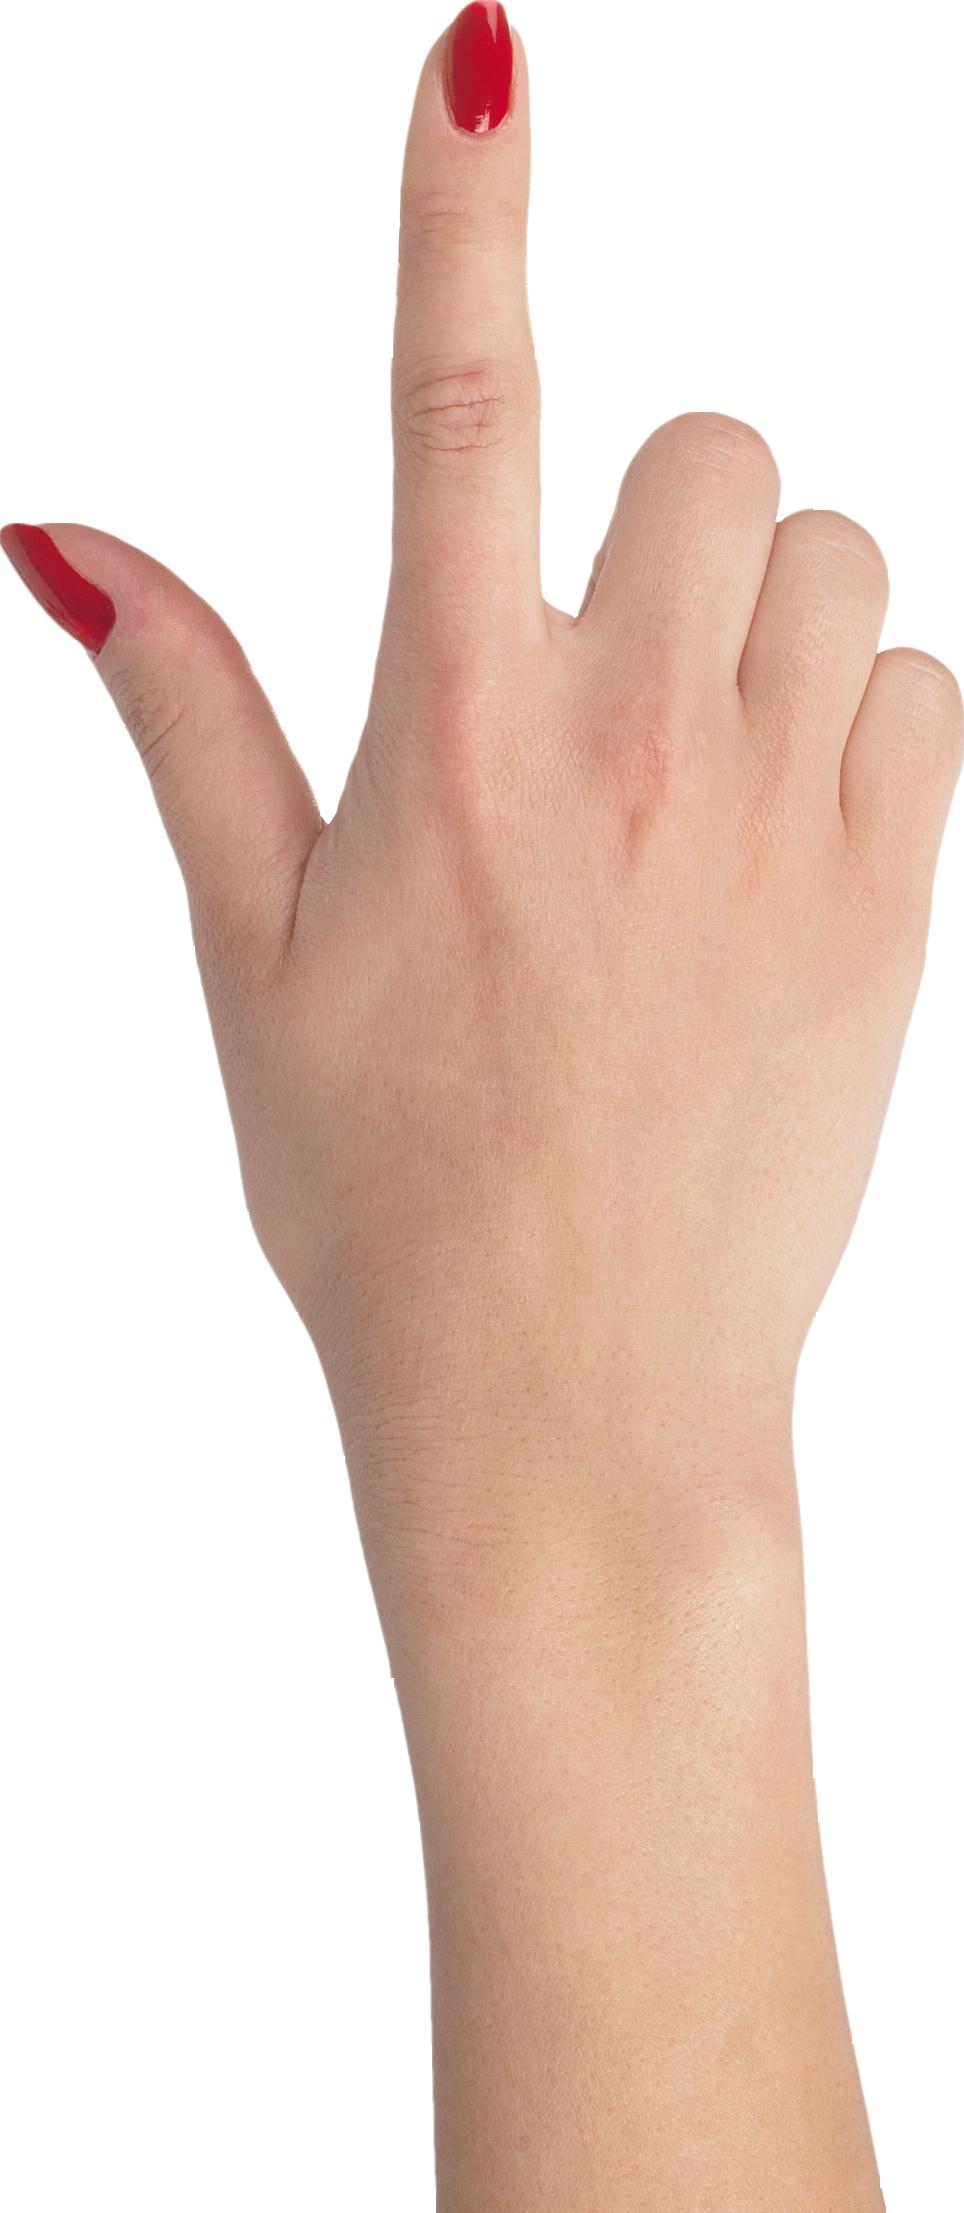 Fingers PNG images free download, finger PNG.